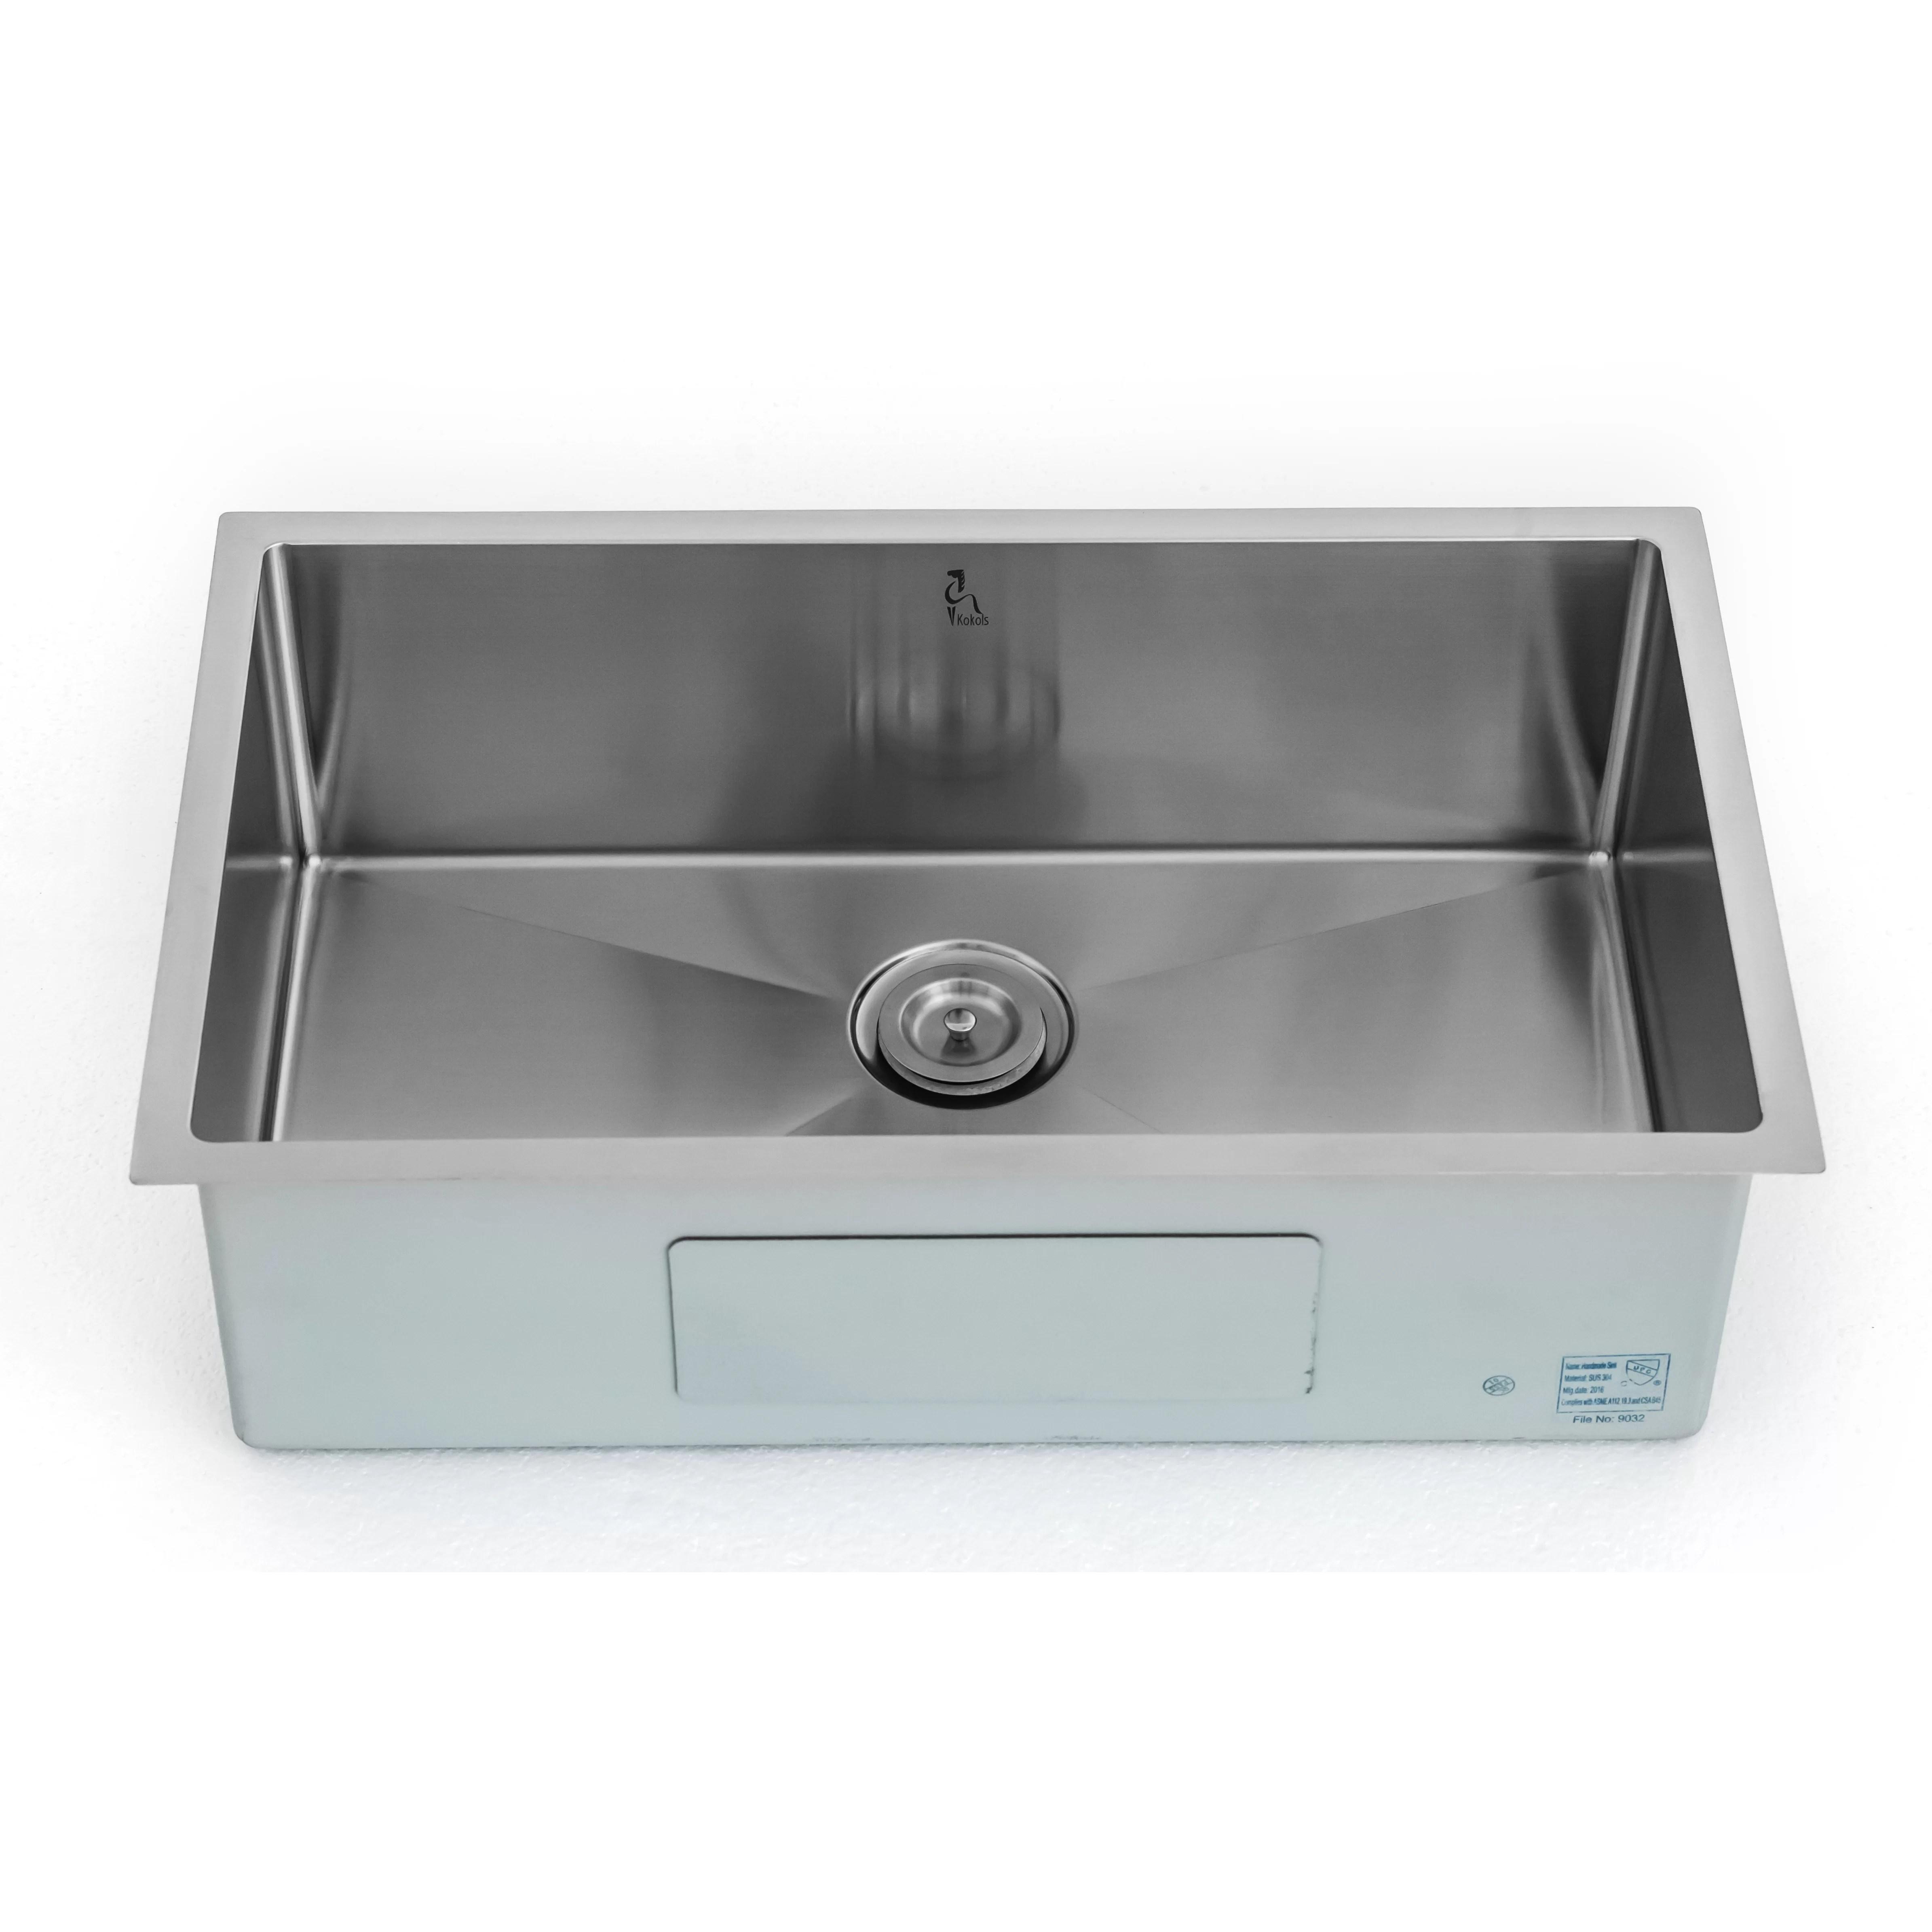 single bowl kitchen sinks commercial hood kokols 30 quot x 18 undermount sink wayfair